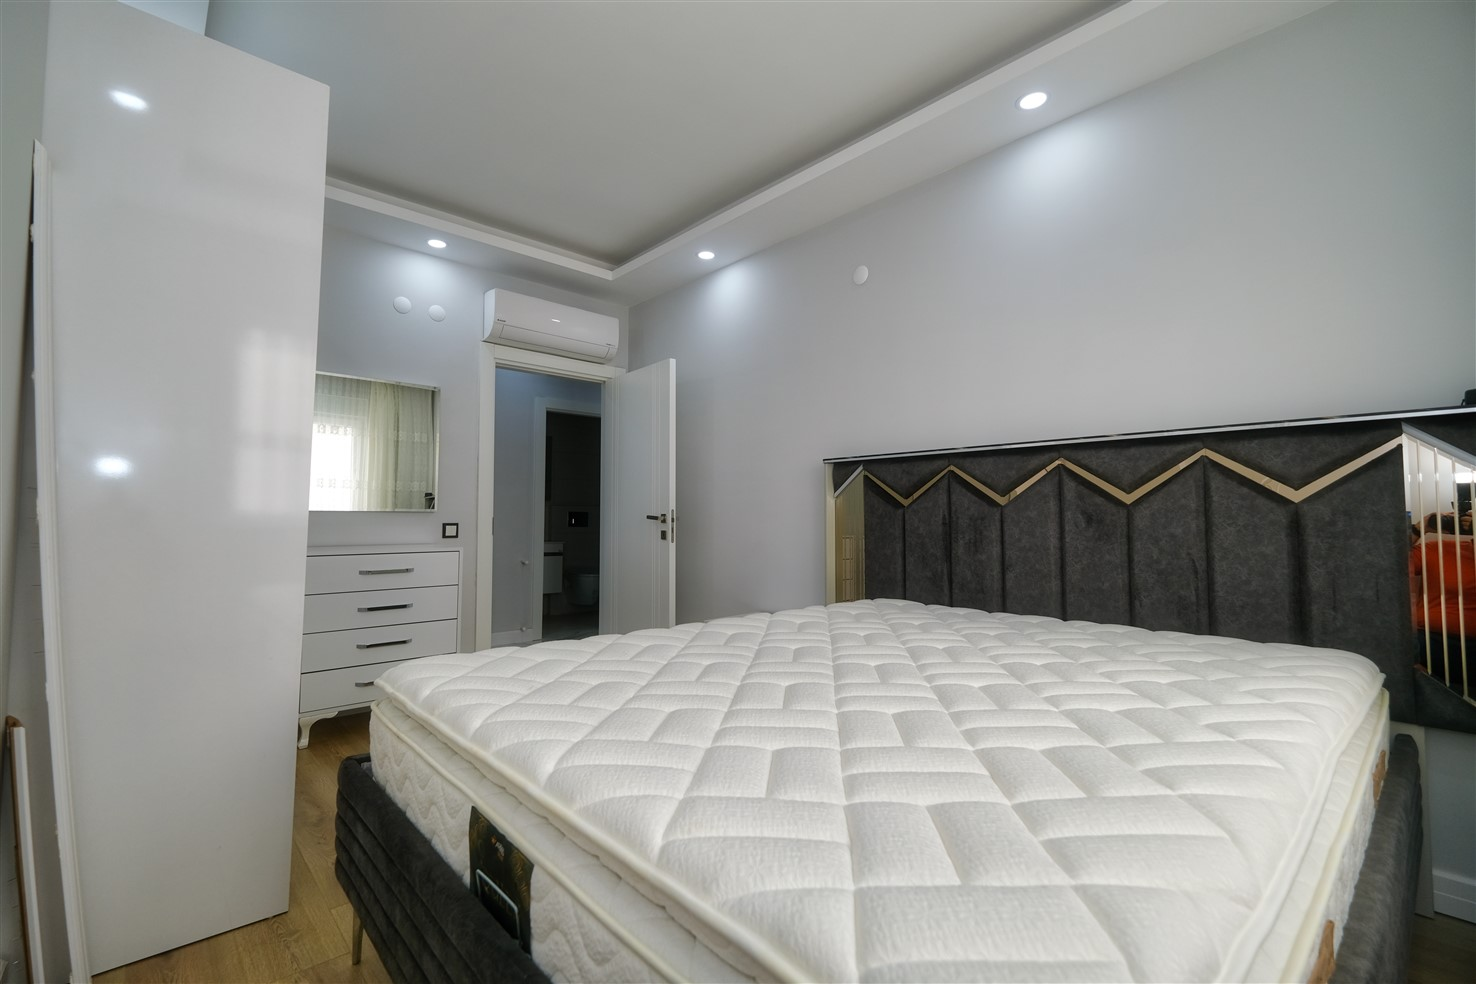 Трёхкомнатная квартира в центре Антальи - Фото 34